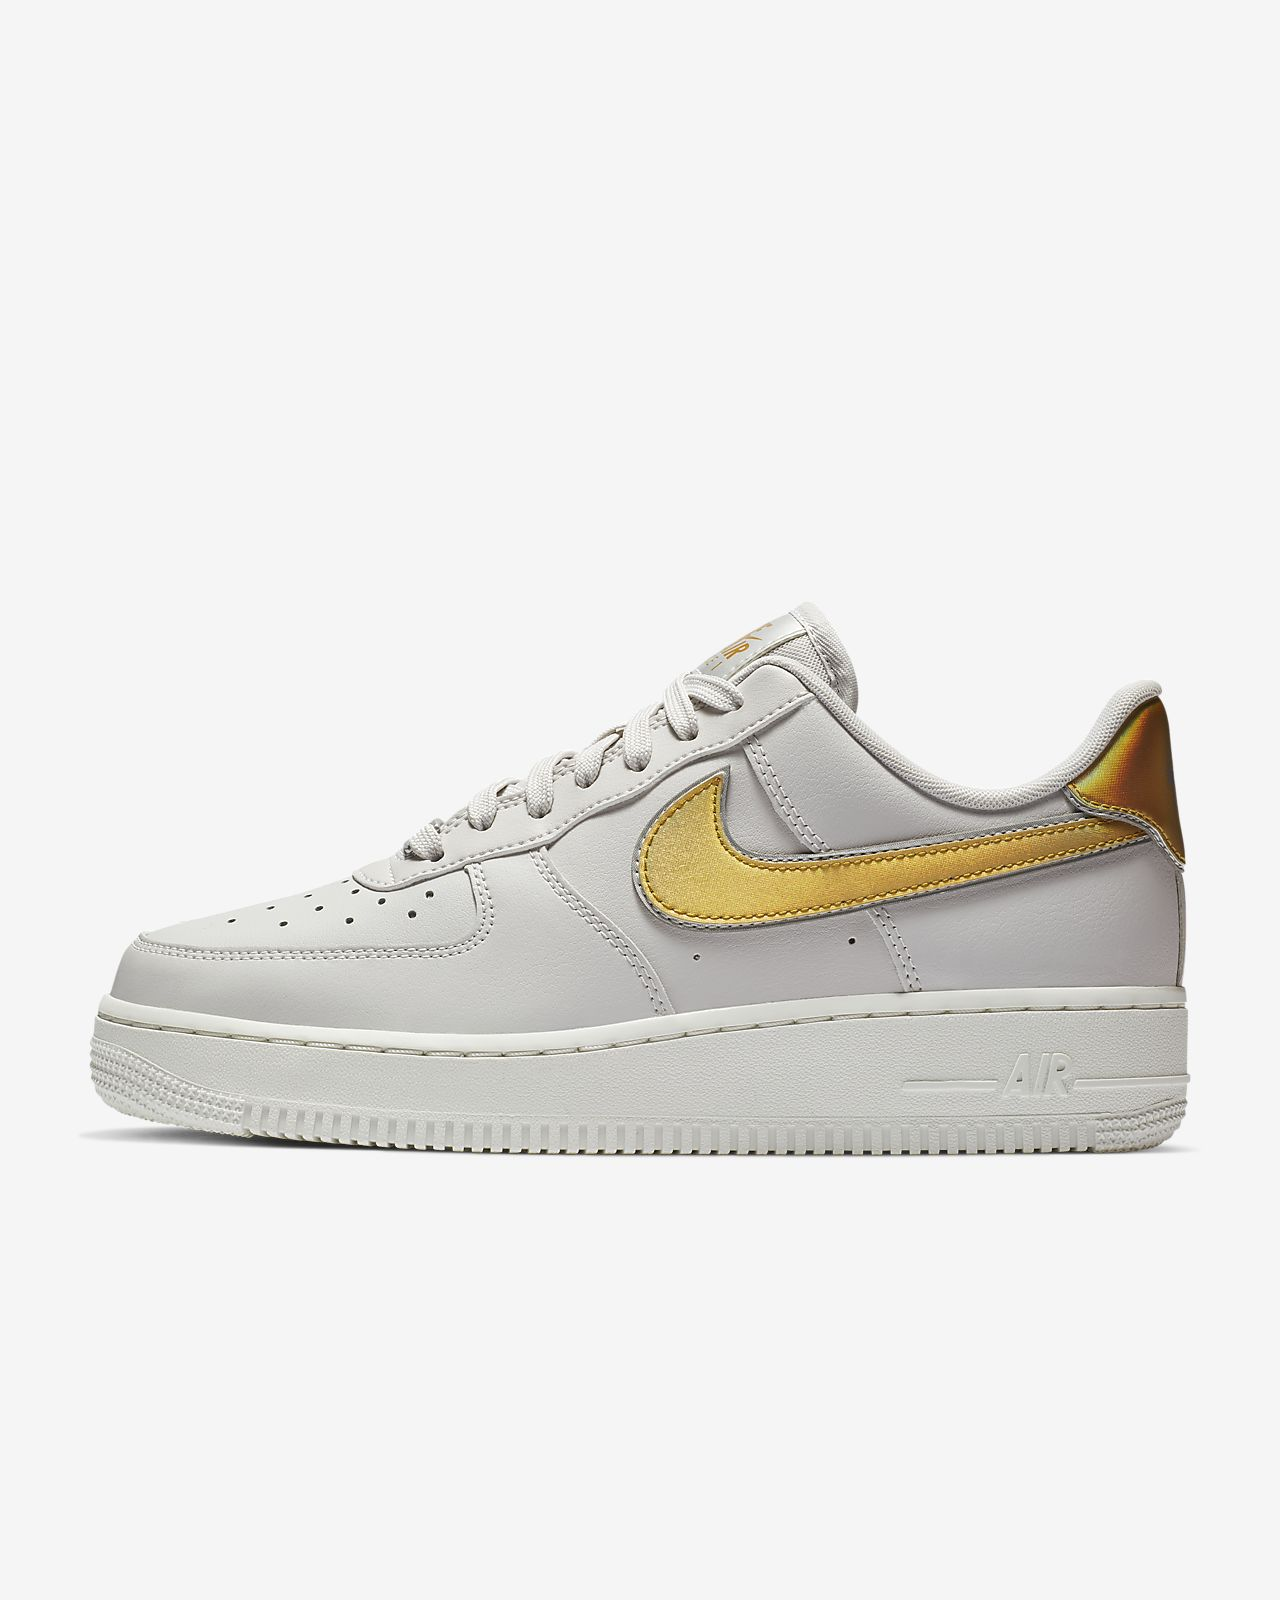 6874032ae99 Nike Air Force 1  07 Metallic Women s Shoe. Nike.com SK